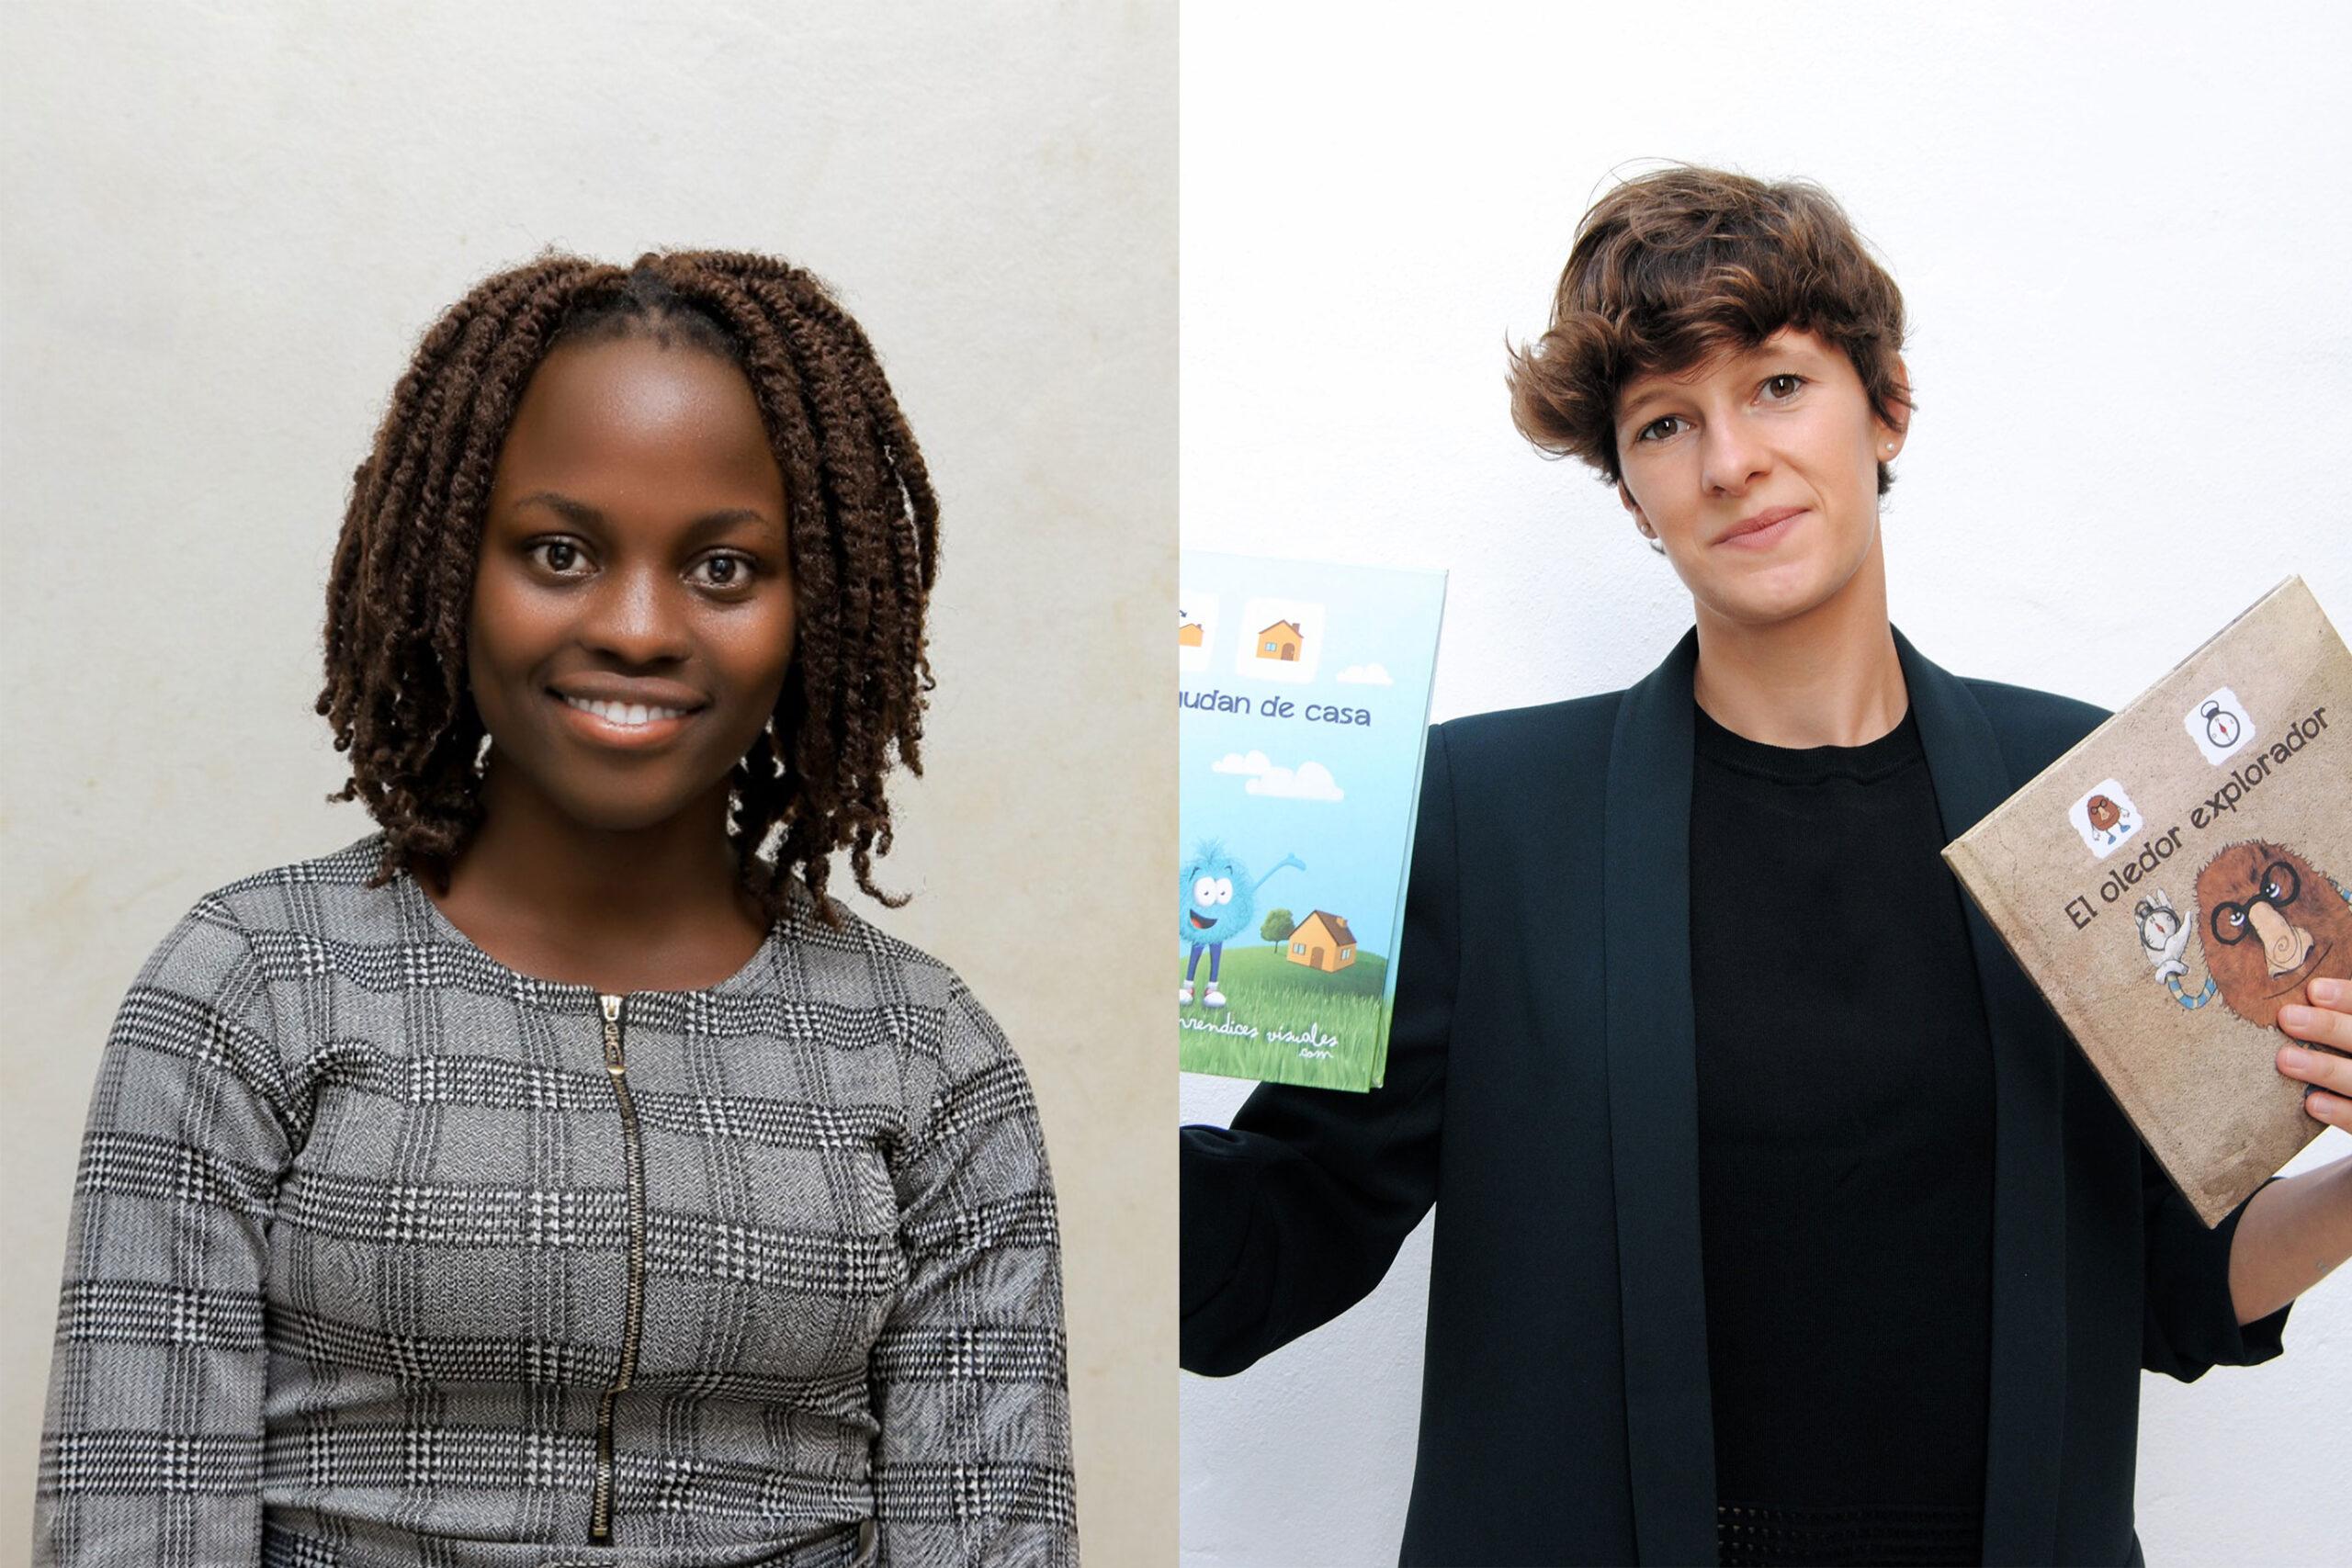 Cynthia and Amelie UN Fellows